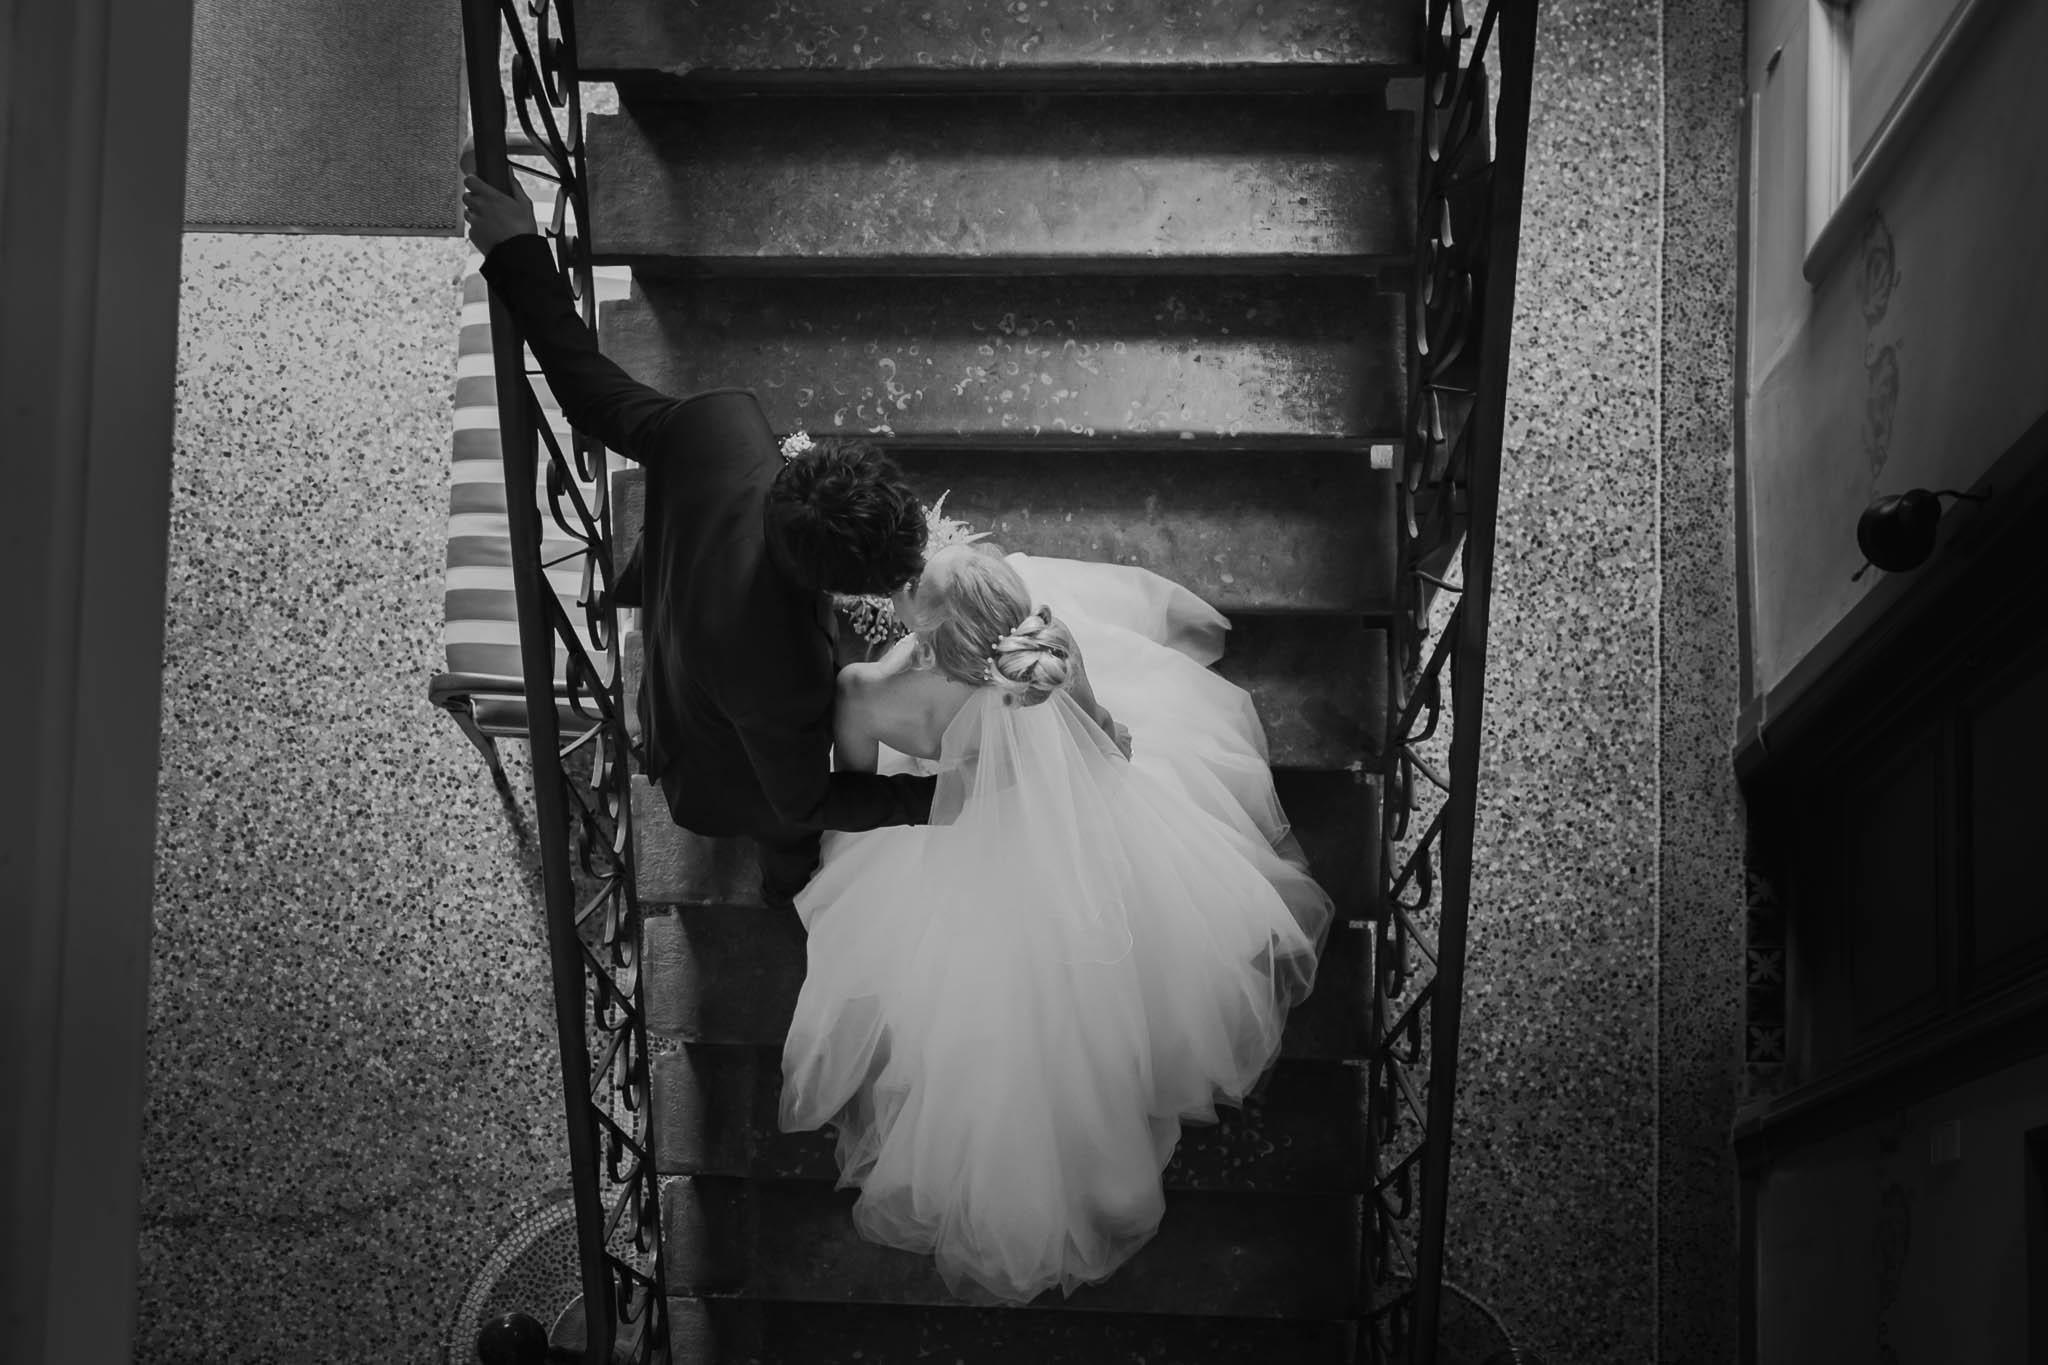 mariage-chateau-gaudras-ingold-62.jpg